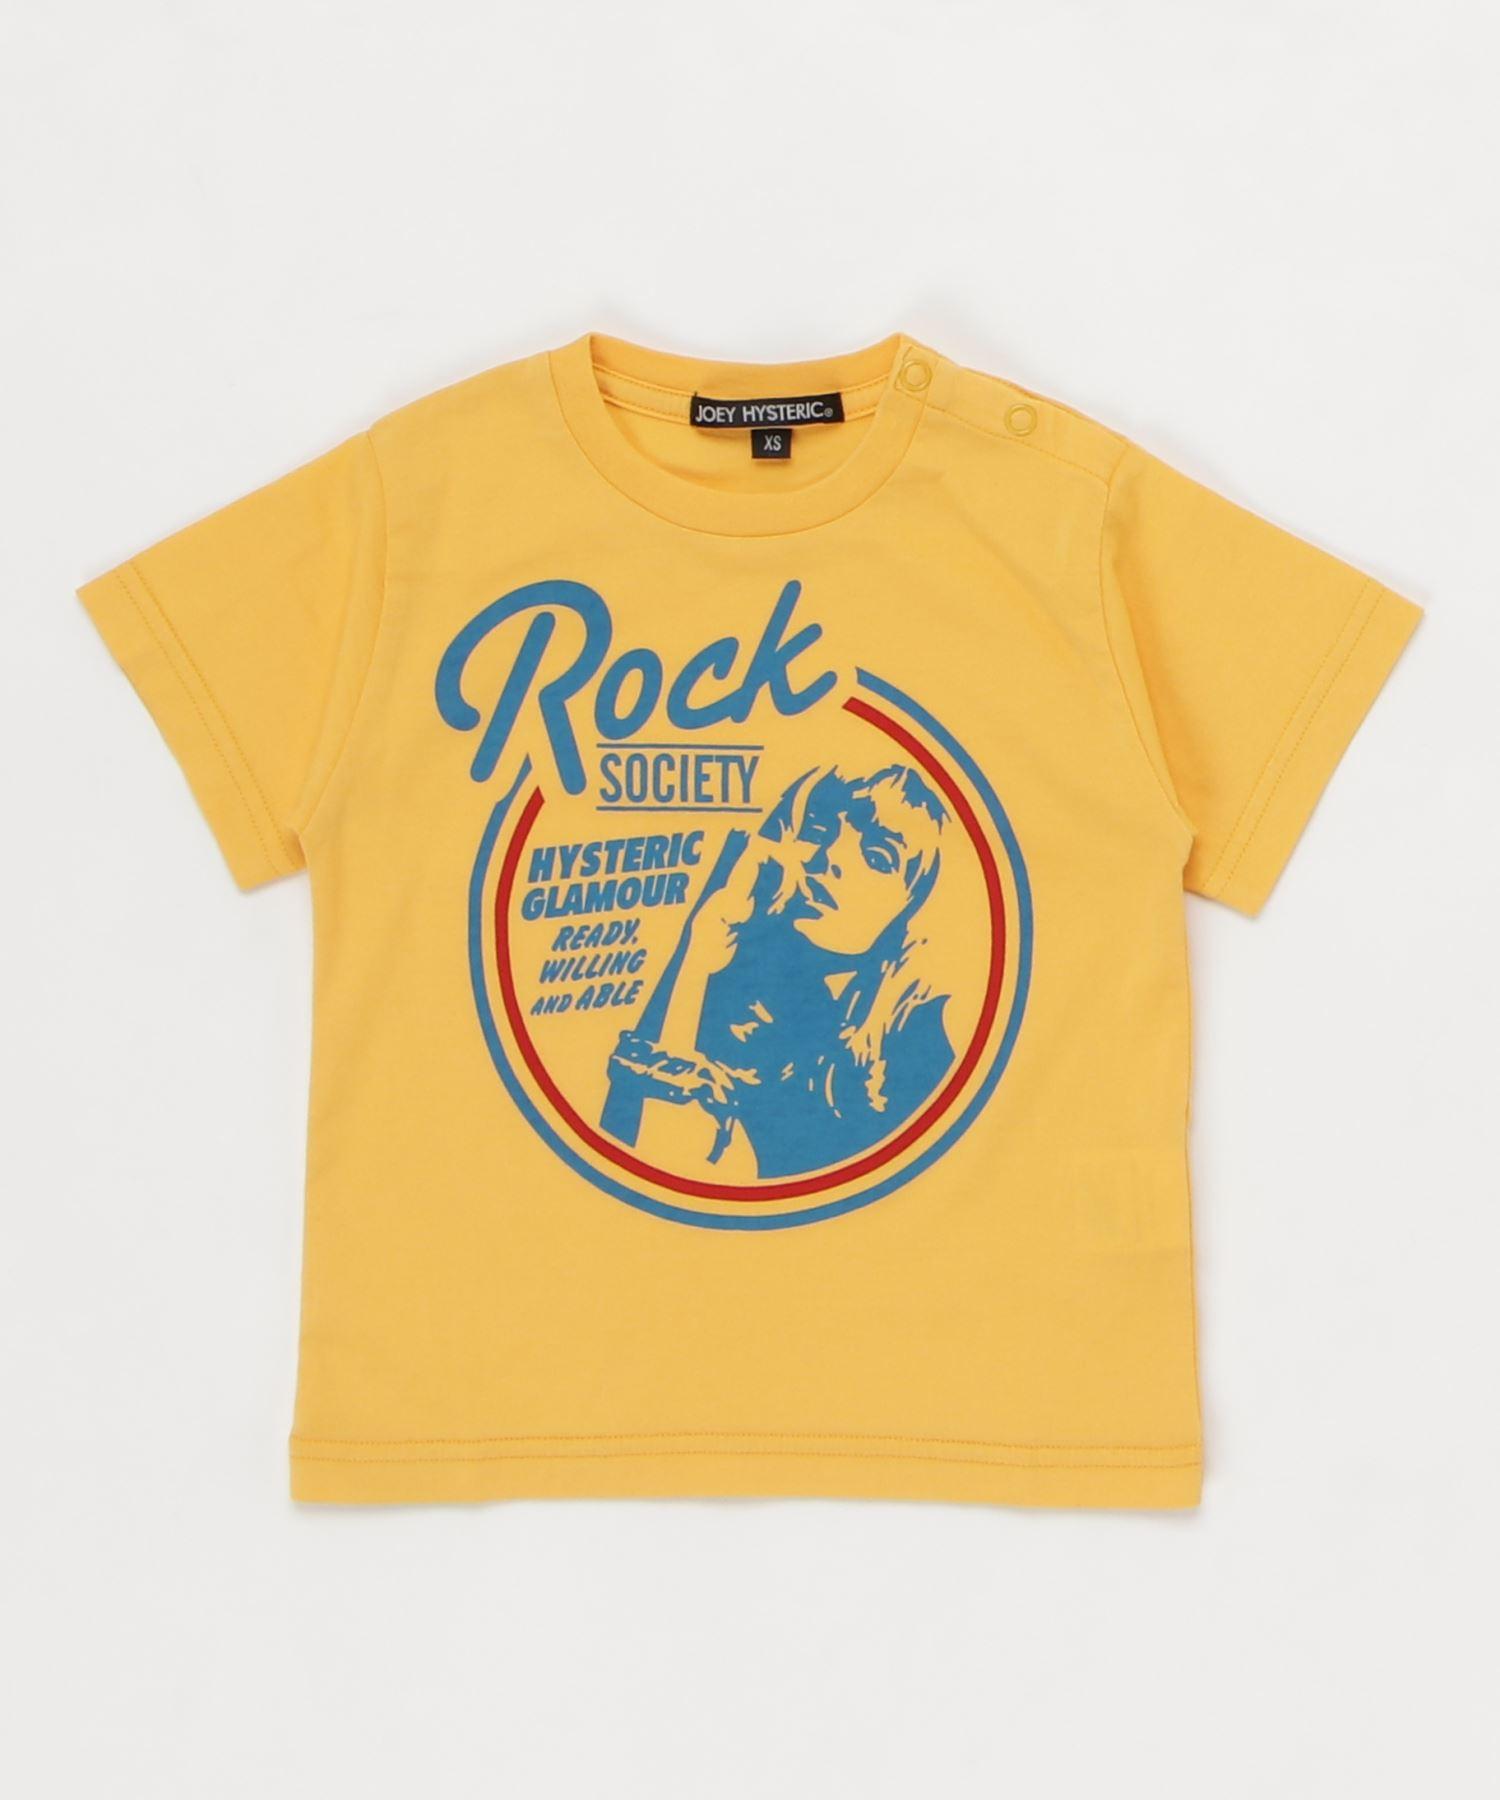 ROCK SOCIETY Tシャツ【XS/S/M】